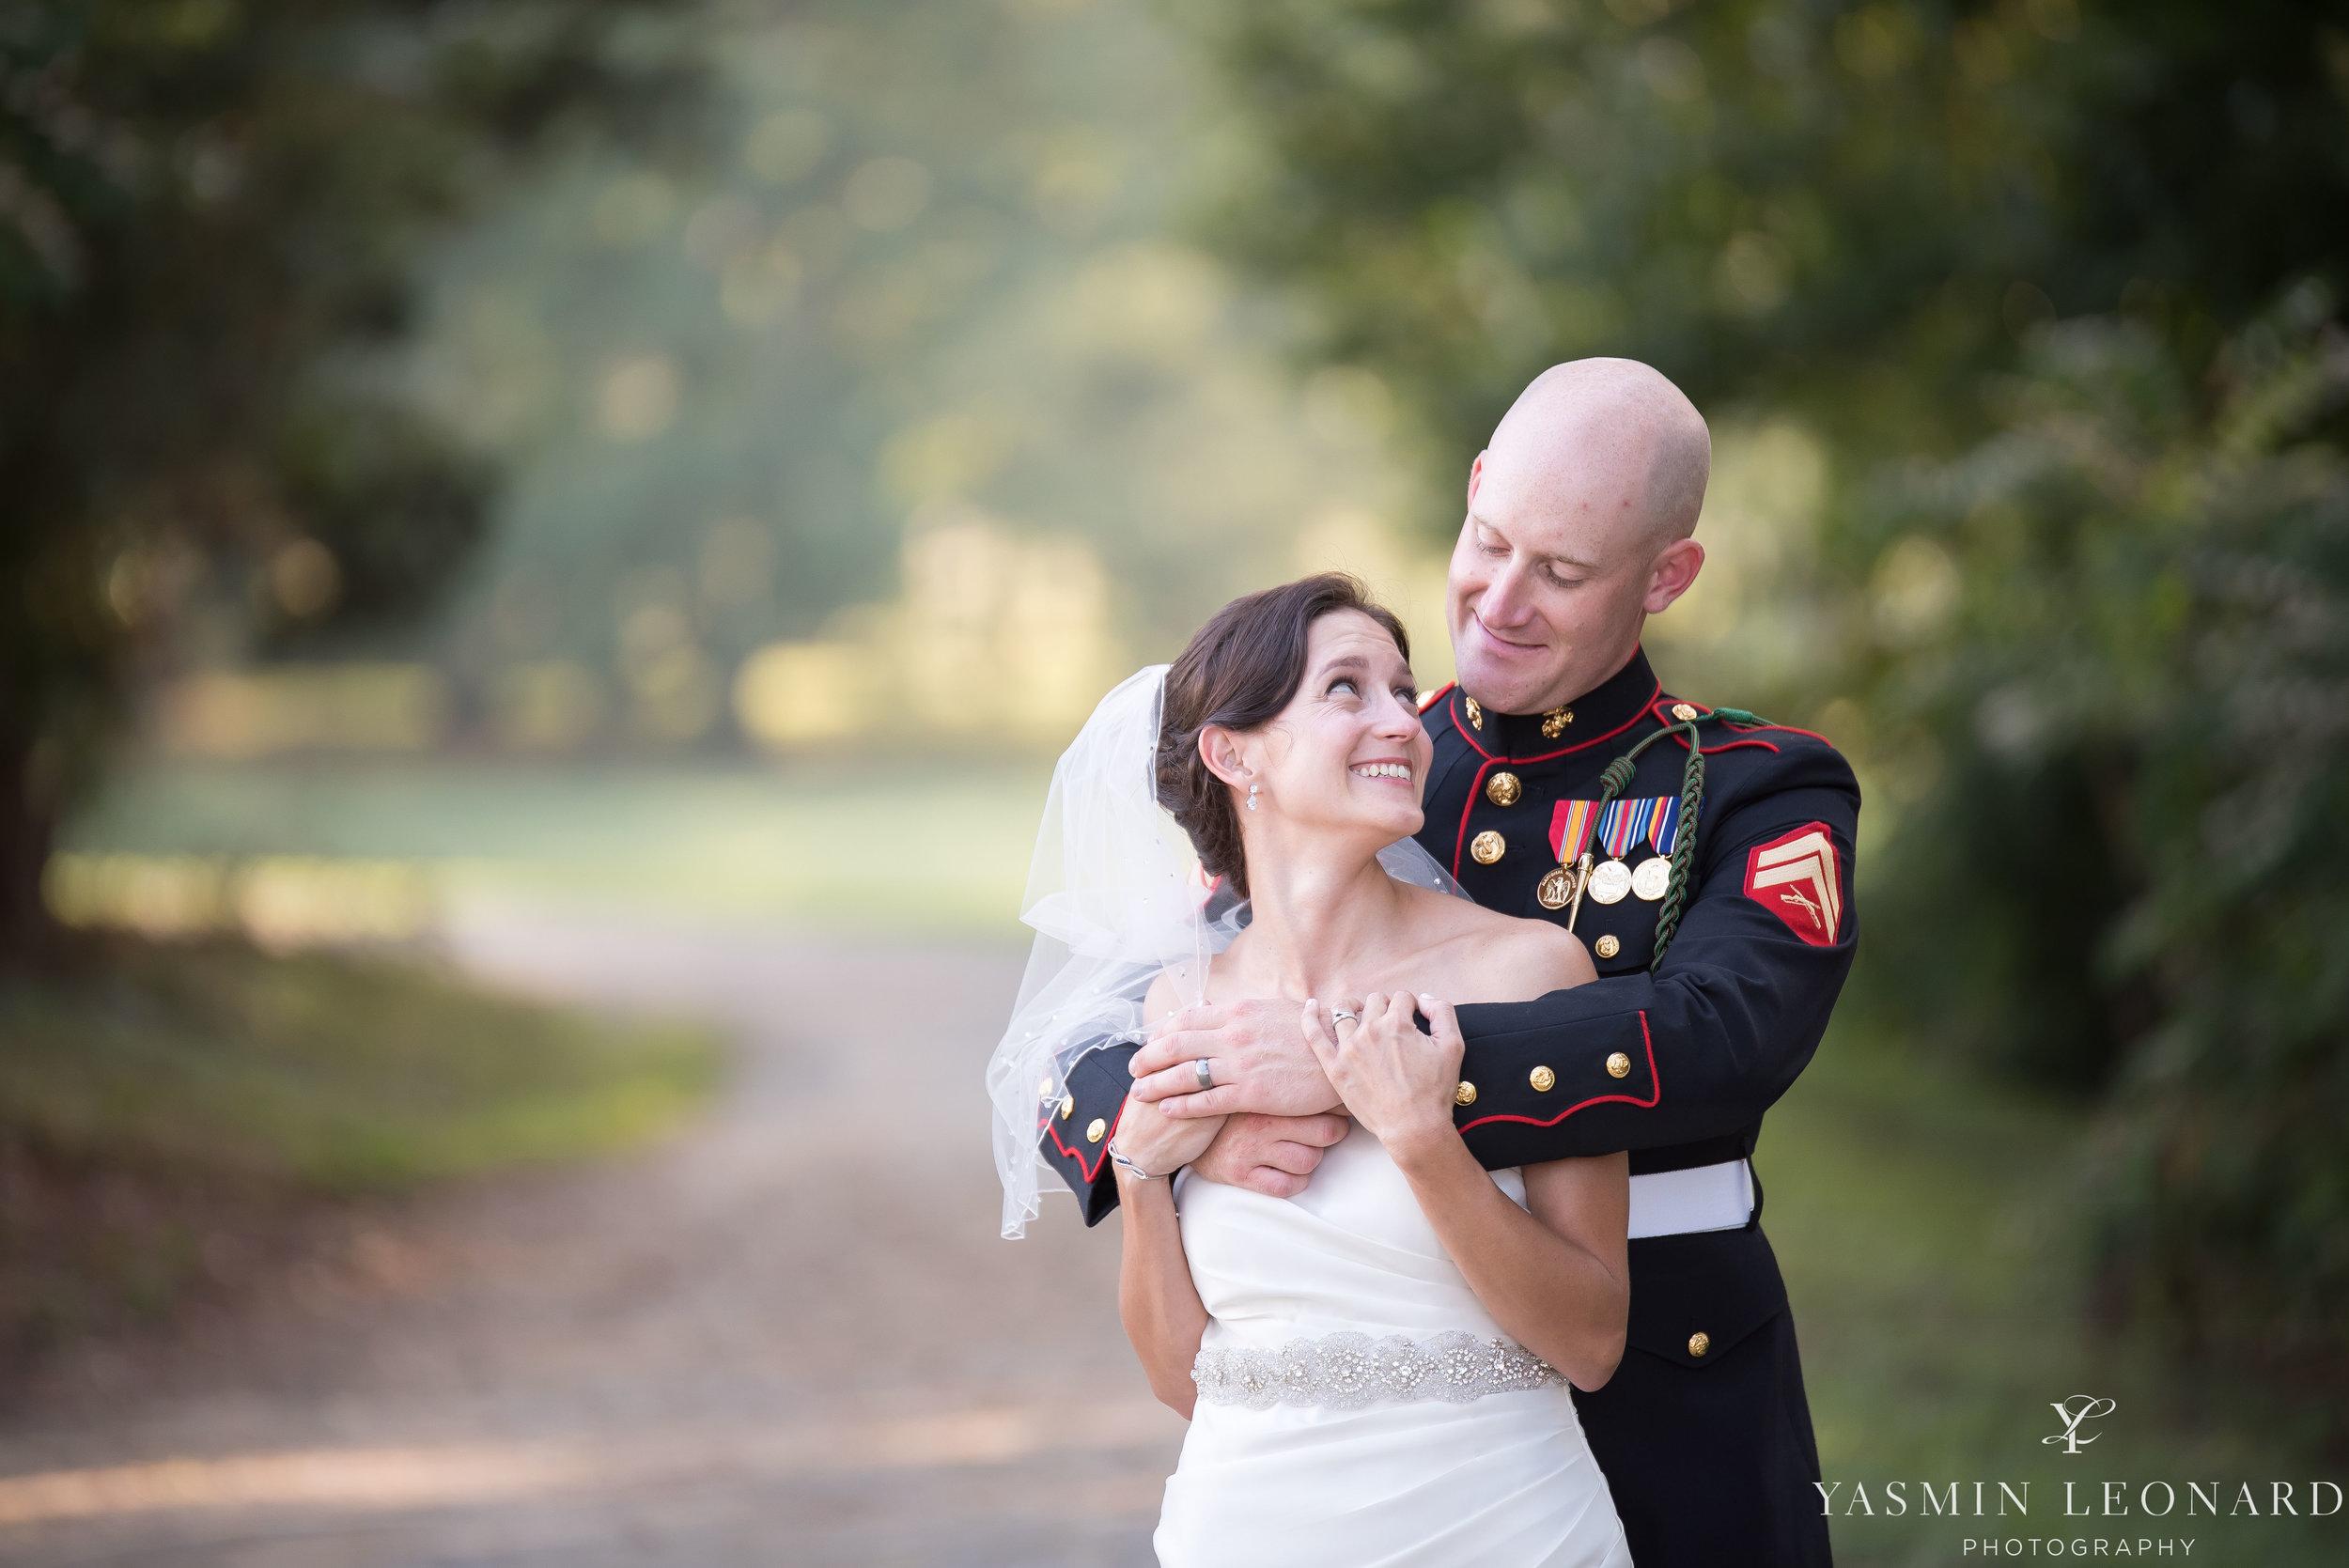 Sara and Nathan | Summerfield Farms | Yasmin Leonard Photography-46.jpg